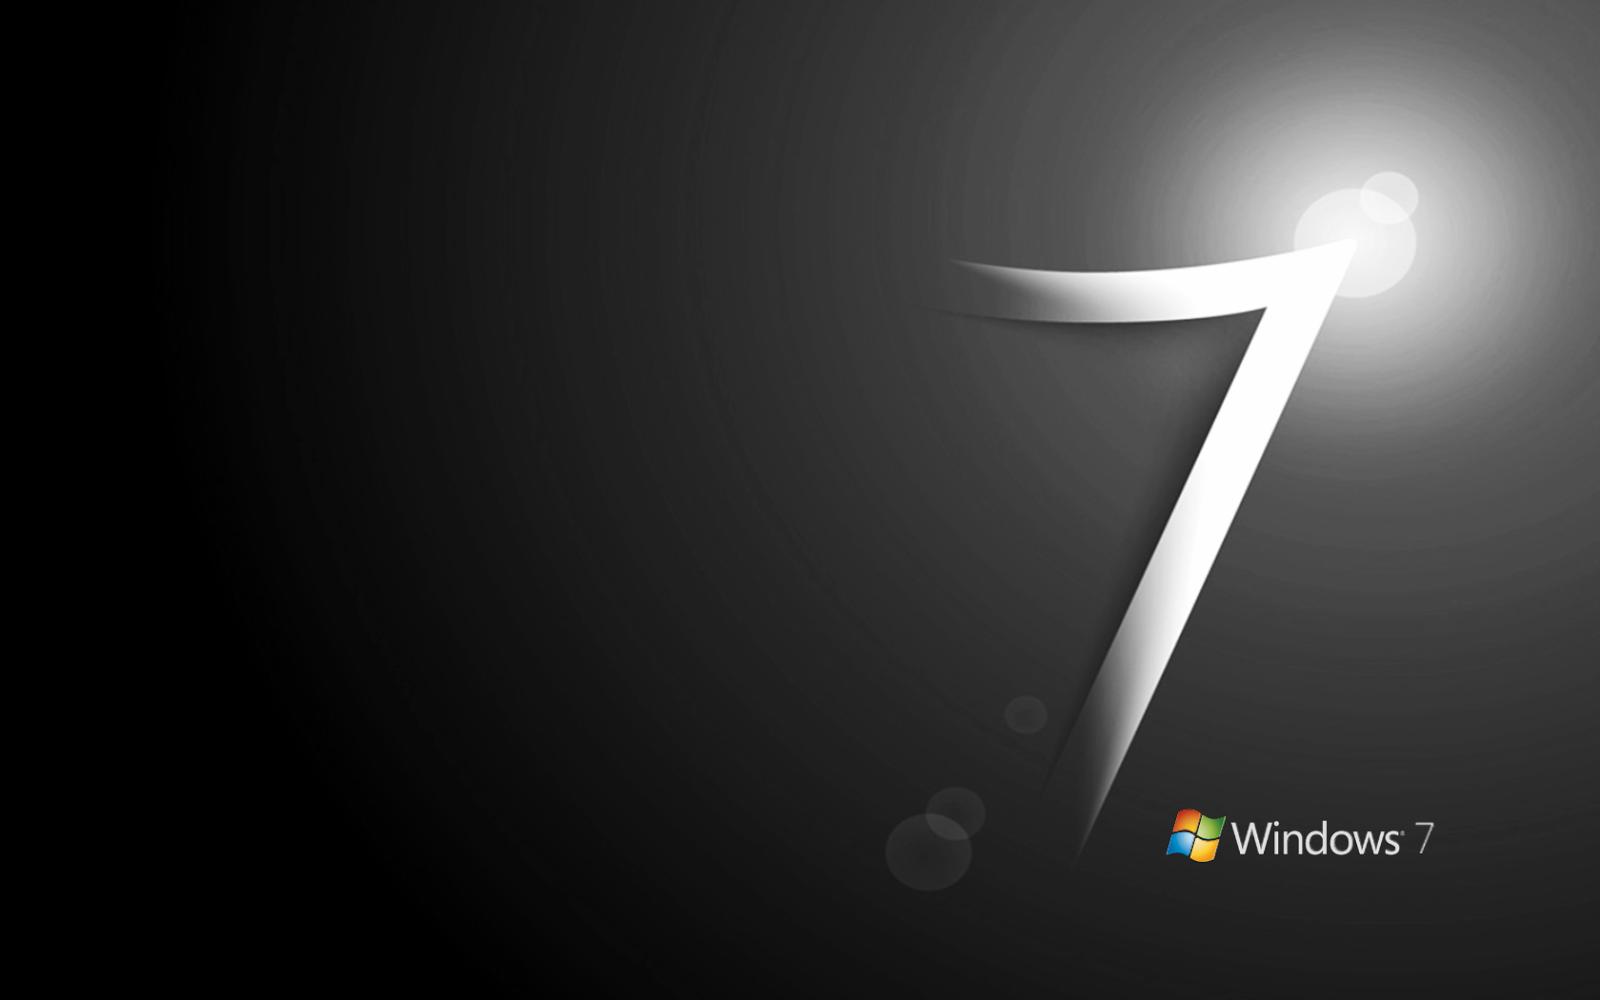 wallpaper win 7 widescreen all wallpapers desktop